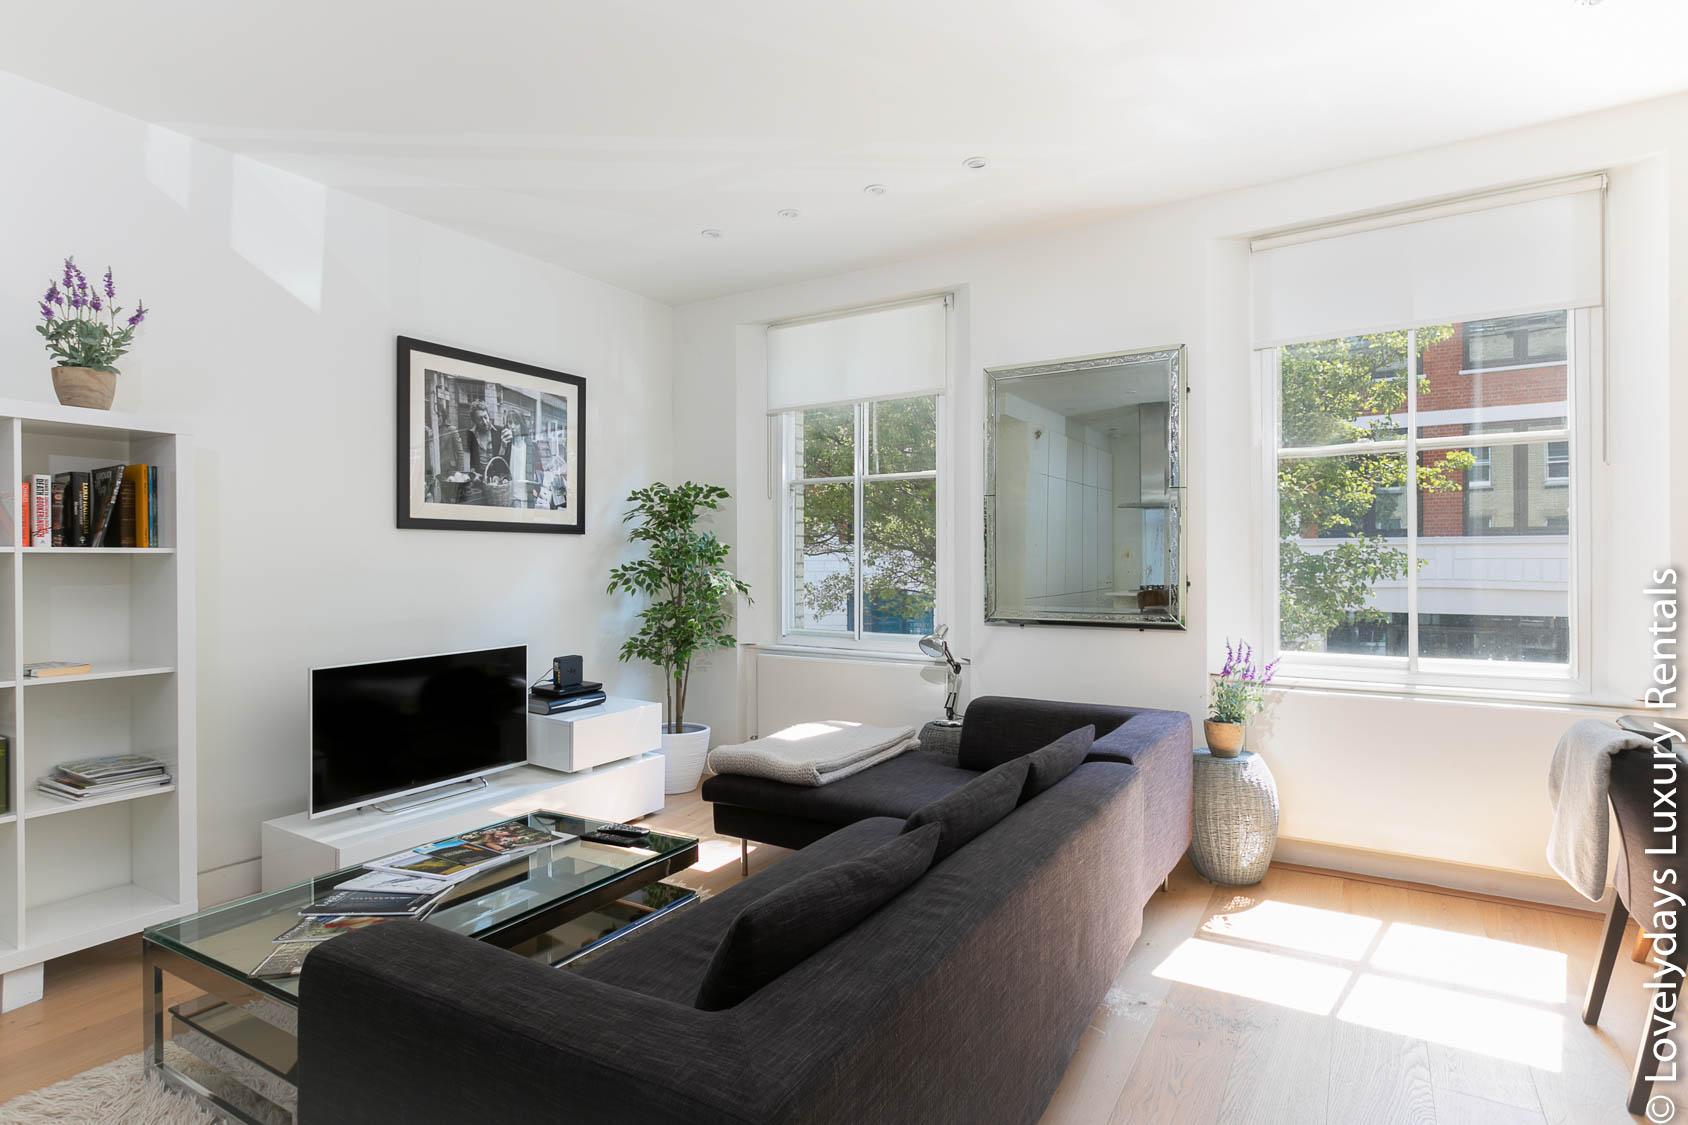 Lovelydays luxury service apartment rental - London - Fitzrovia - Foley Street - Lovelysuite - 2 bedrooms - 2 bathrooms - Luxury living room - Comfortable sofa - TV system - 1b9cc8c28463 - Lovelydays